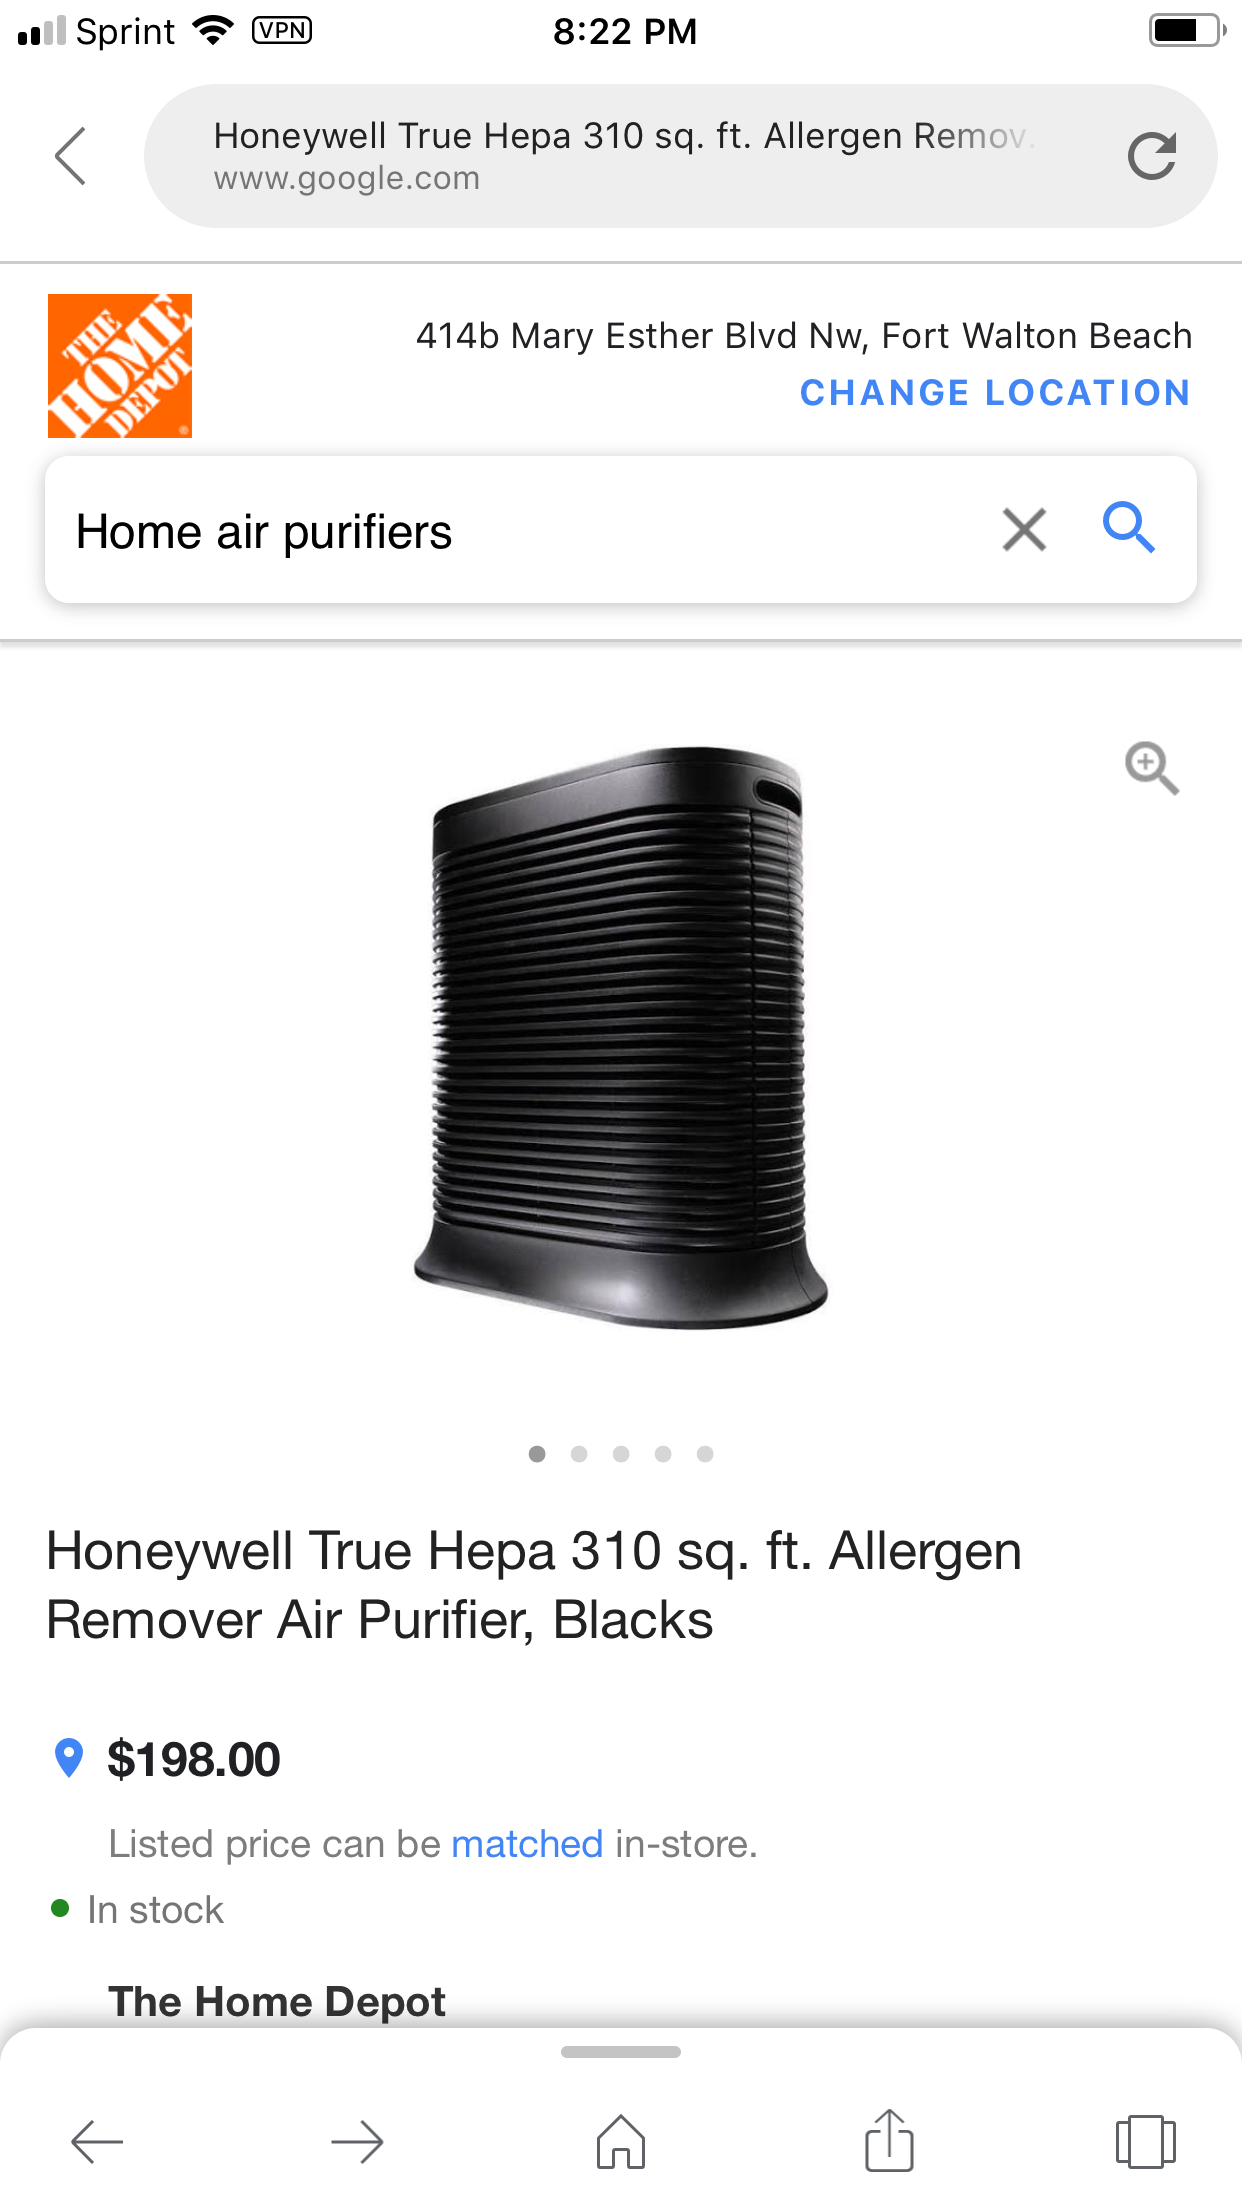 Pin by Cynthia Fox on Misc. in 2020 Honeywell air